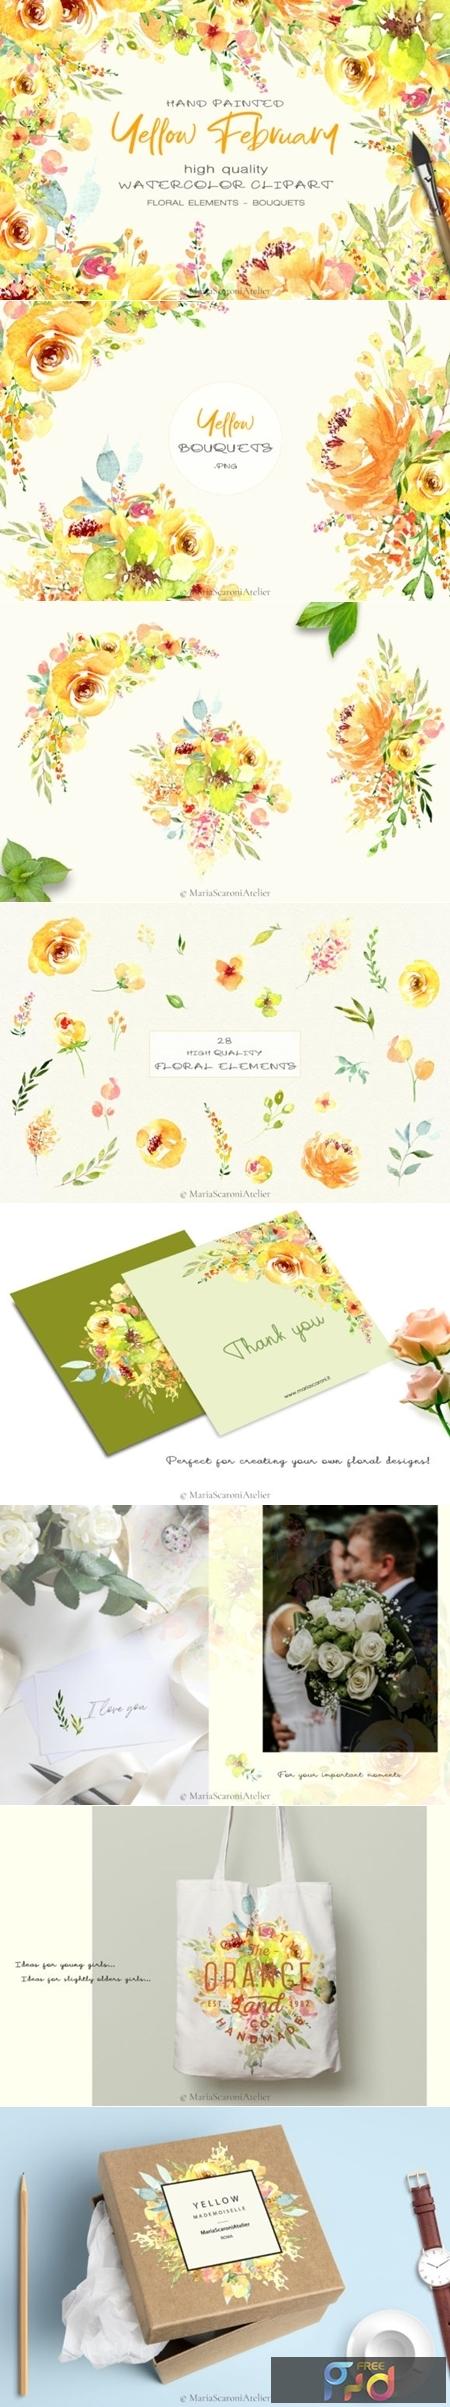 Watercolor Flowers 3016297 1